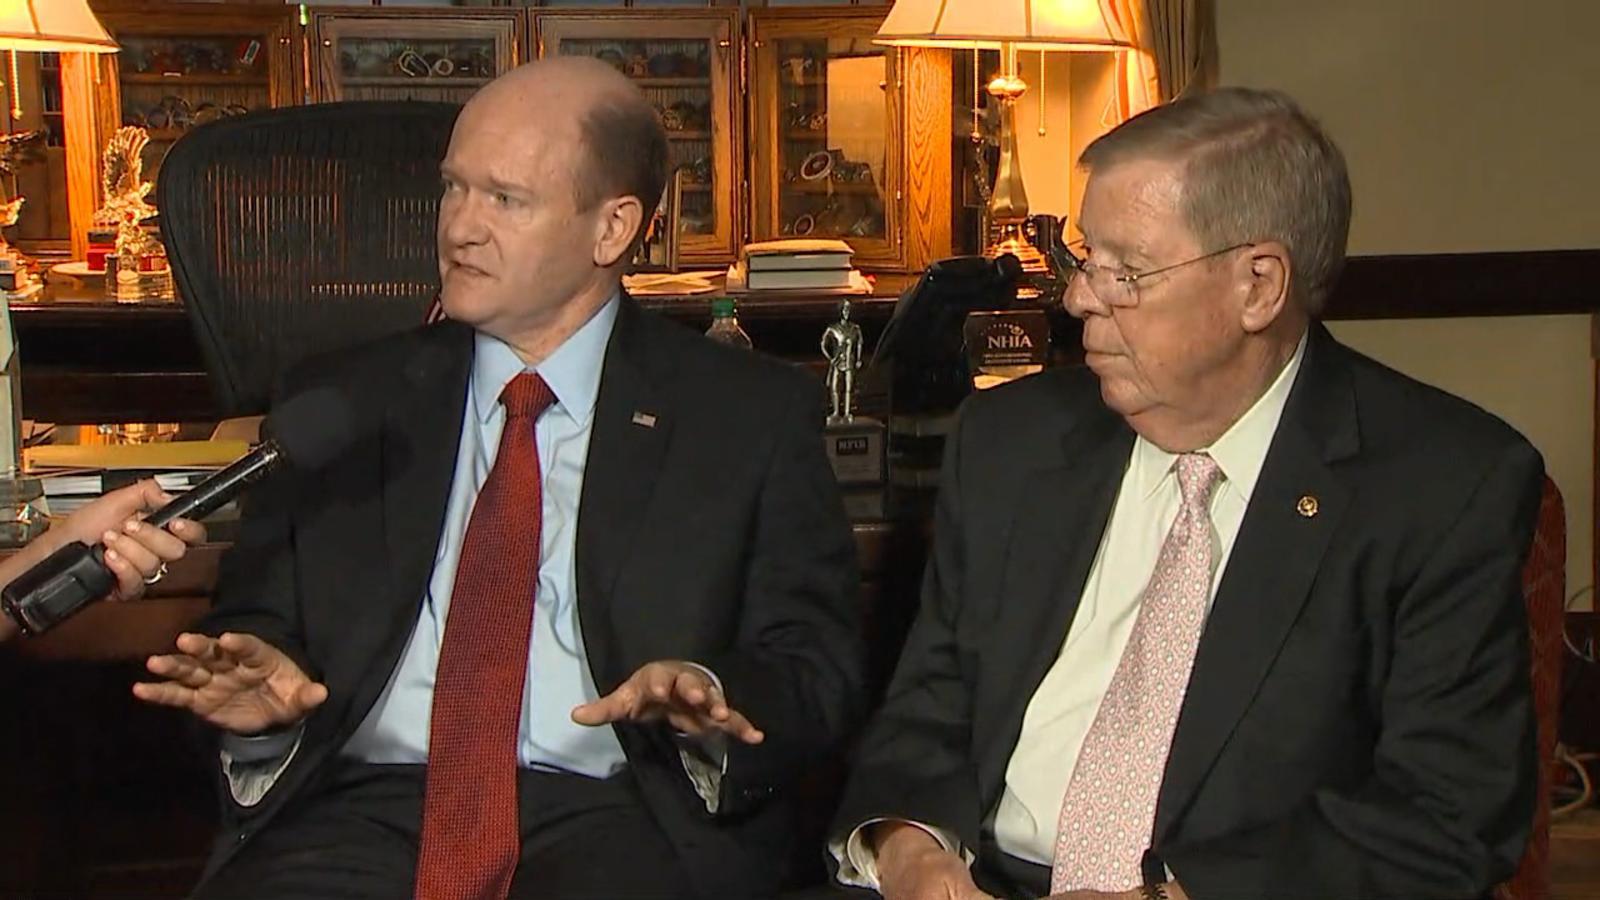 Senators Chris Coons and Johnny Isakson